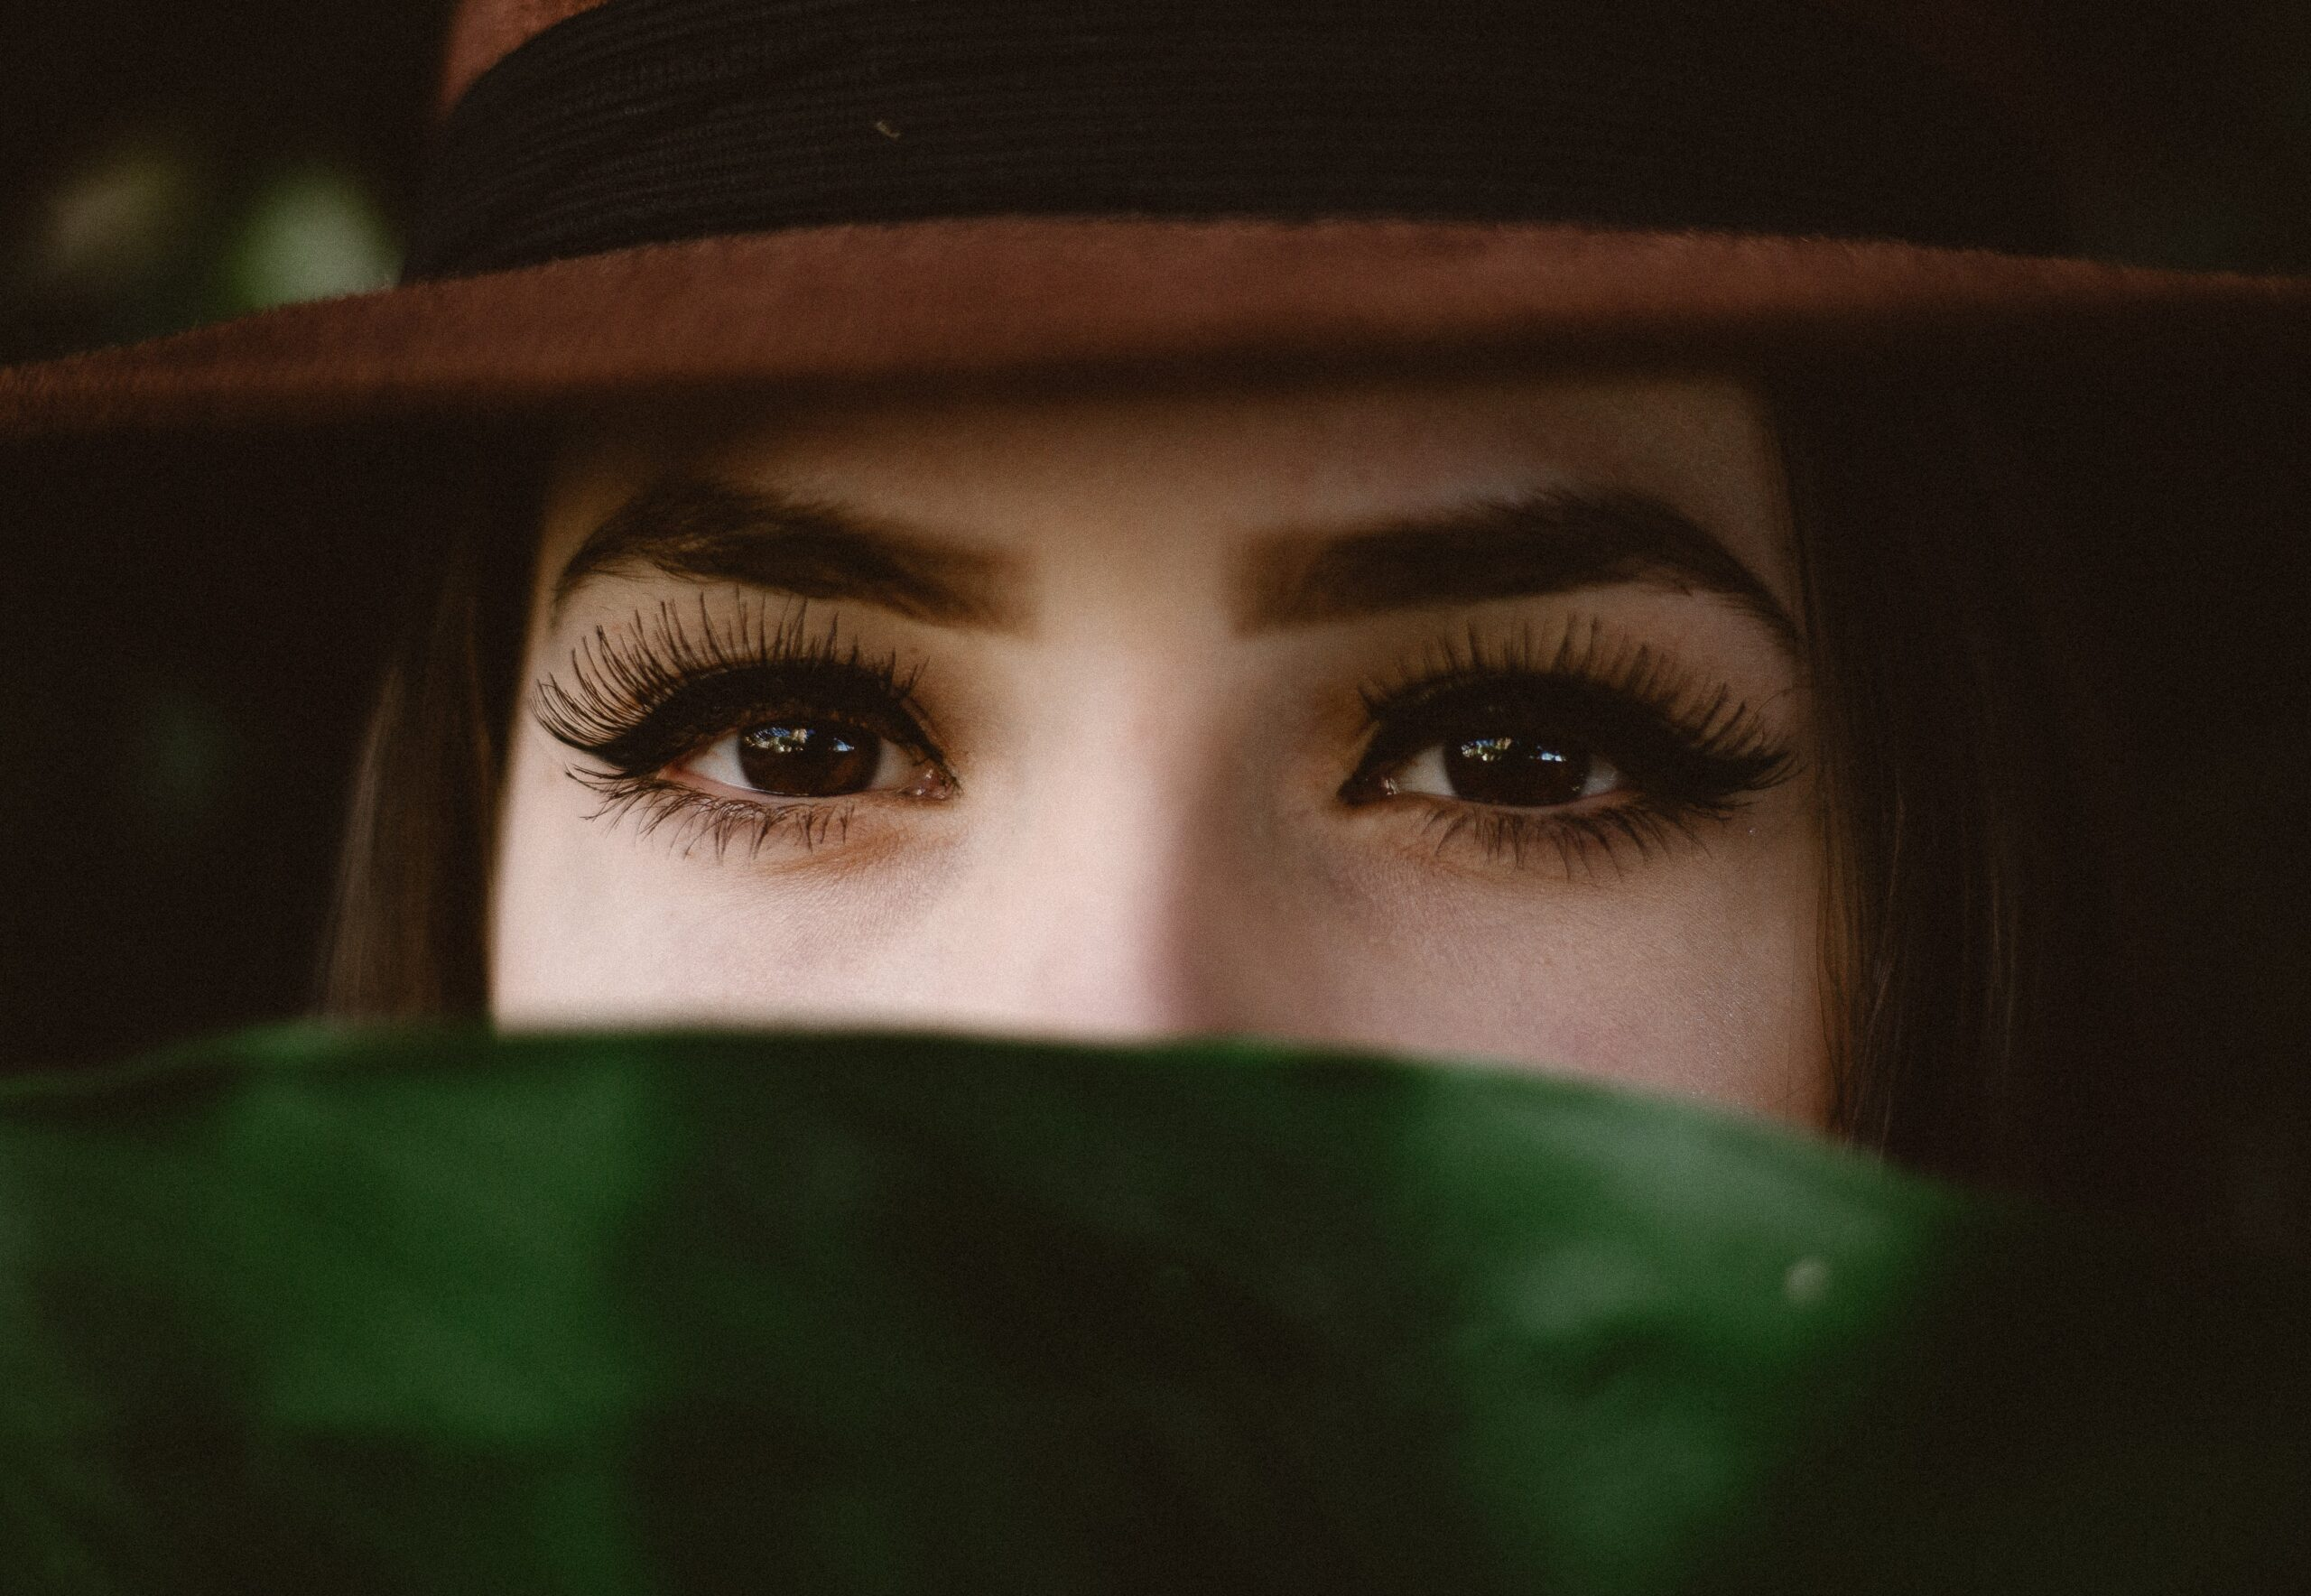 good eyebrows and eyelashes